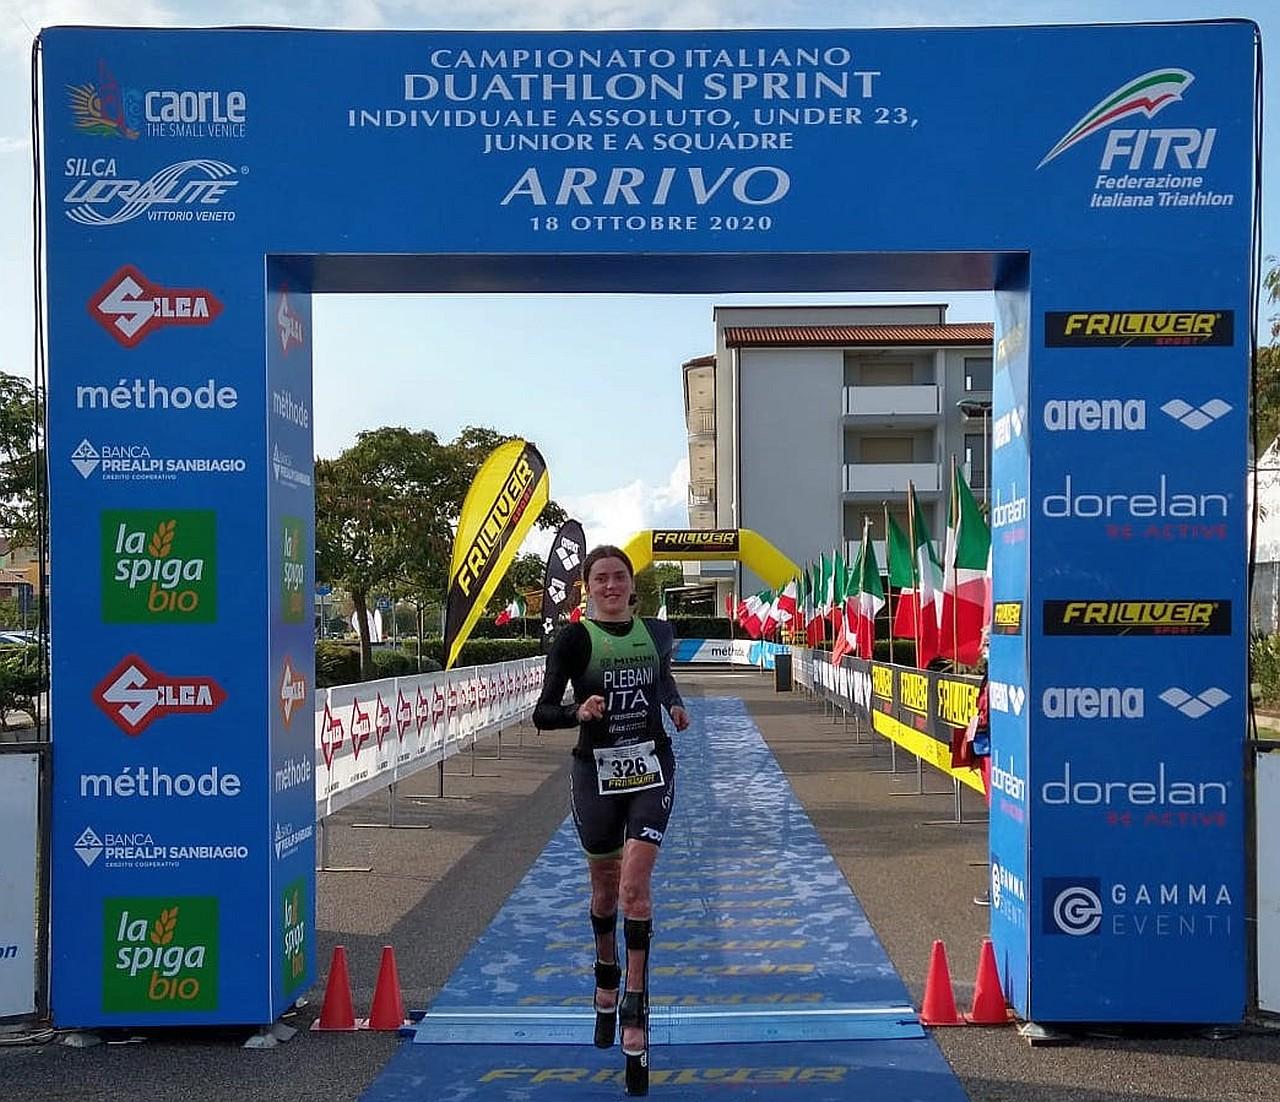 Campionati Italiani Duathlon e Paraduathlon Caorle 2020, taglia la finish line Veronica Yoko Plebani